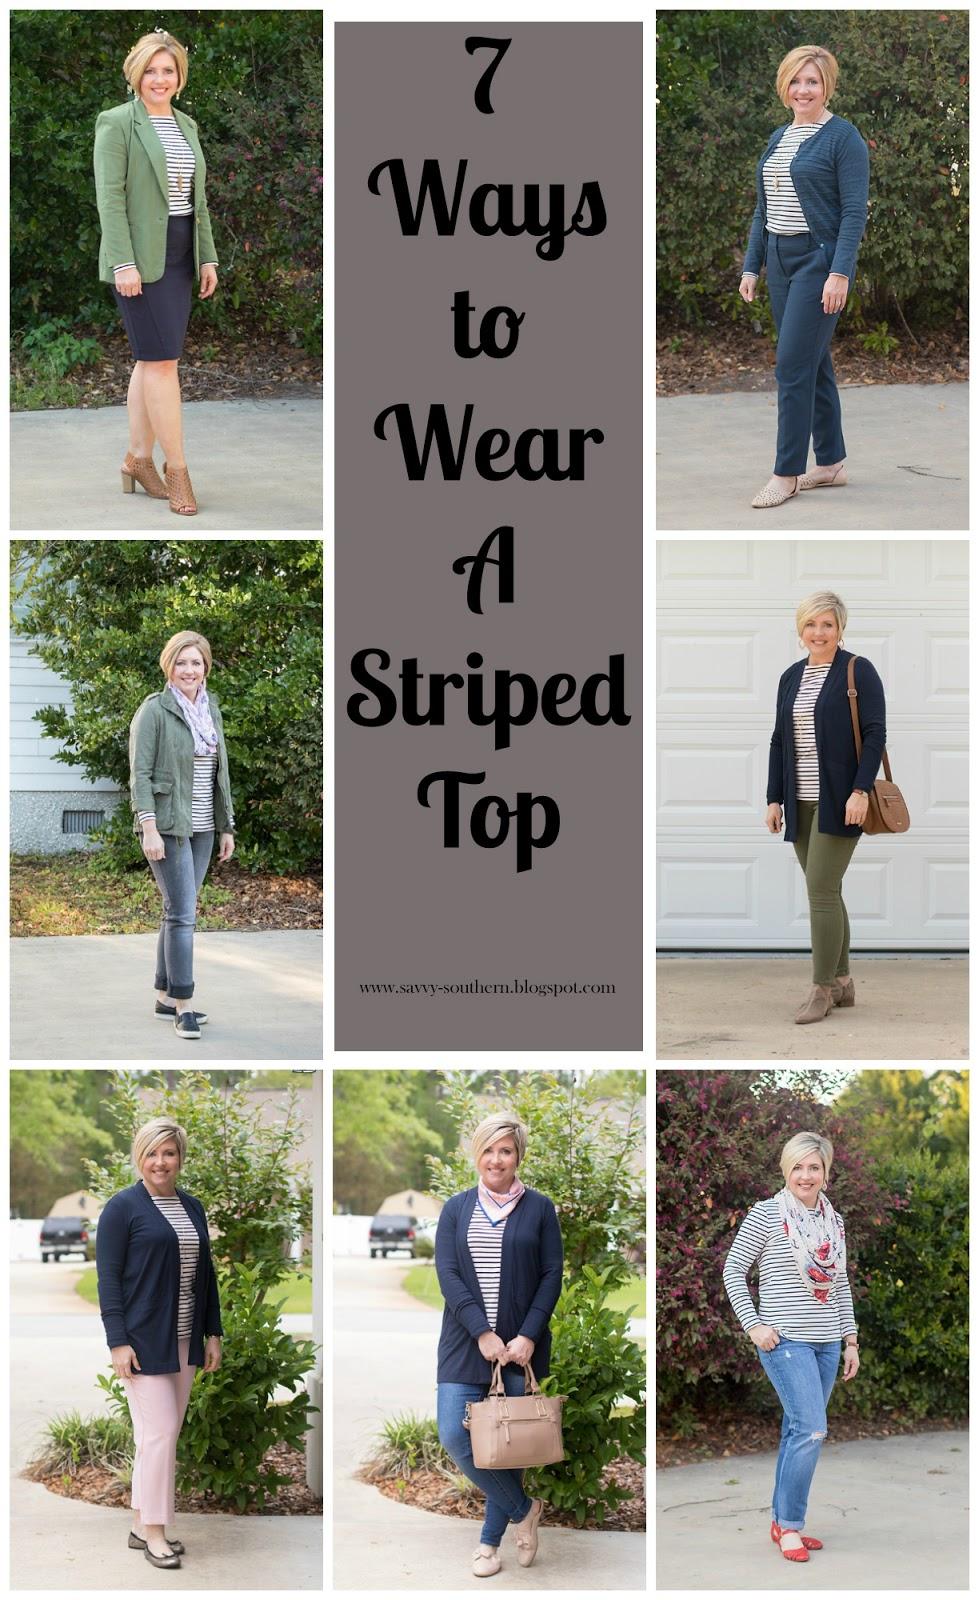 7 ways to wear a striped top